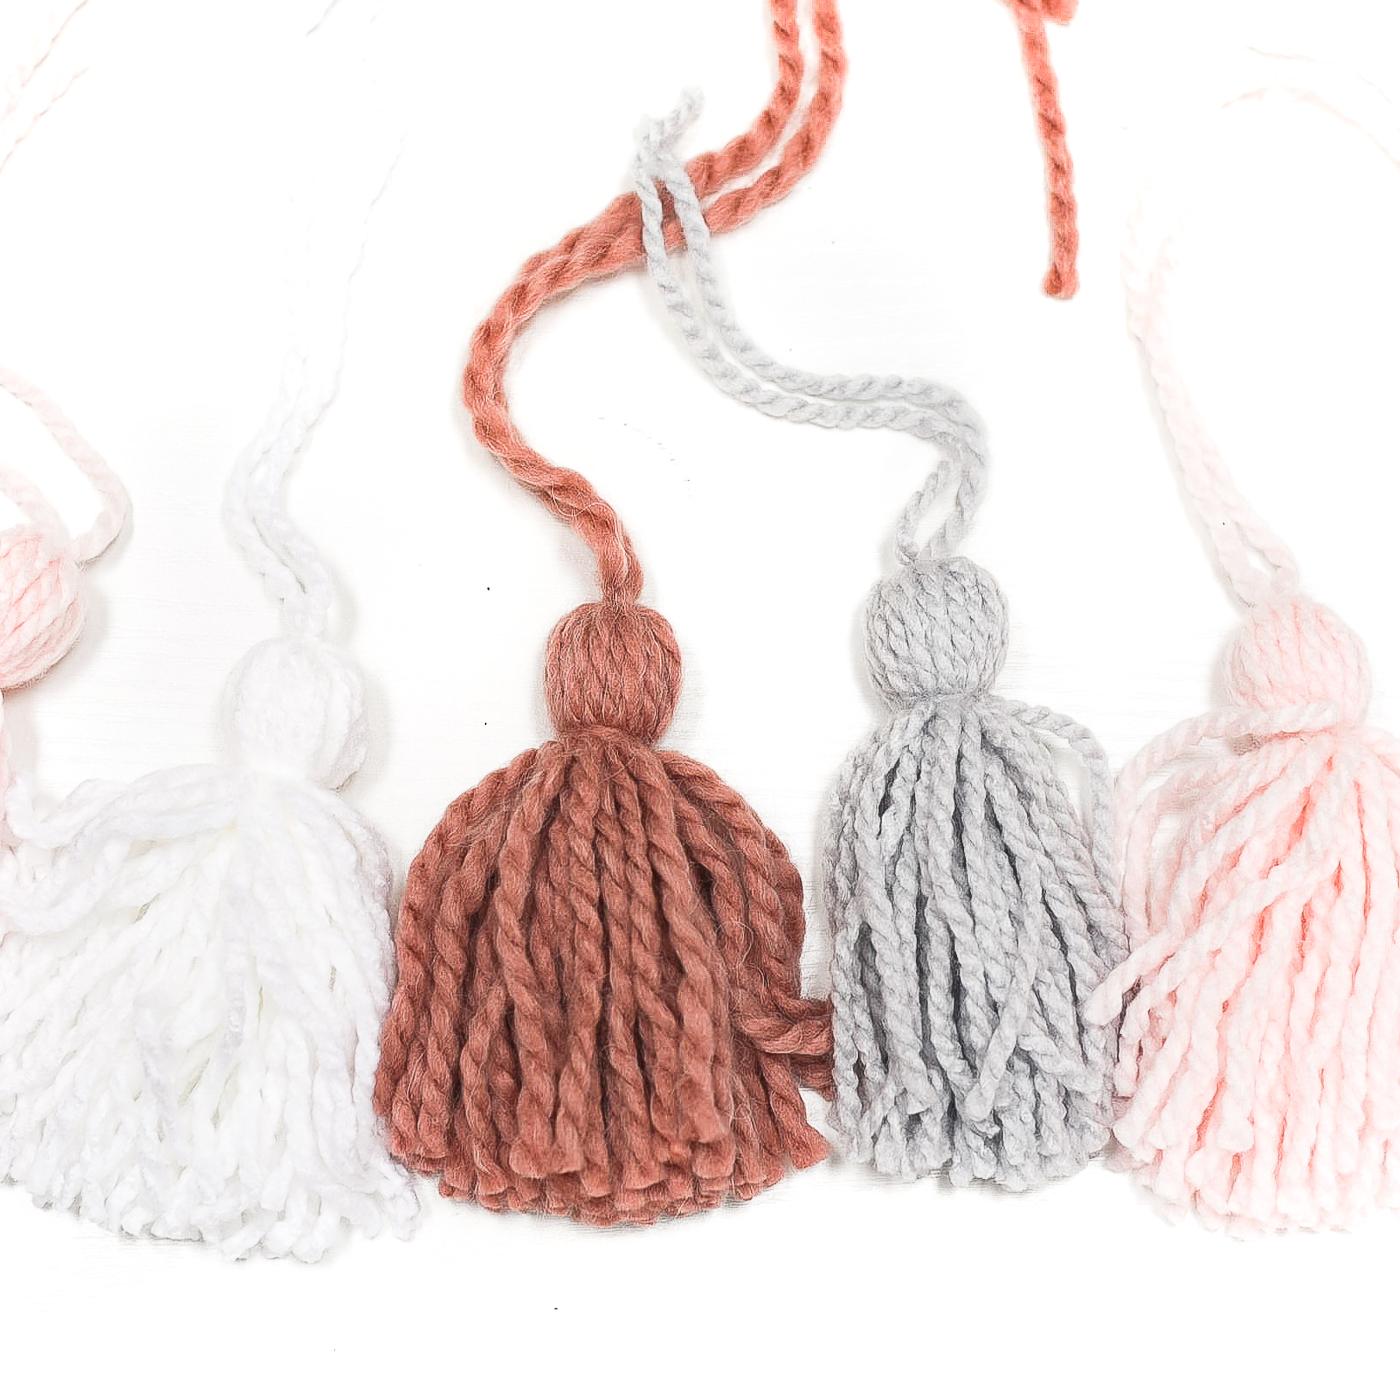 Yarn tassel garland DIY. How to make tassels. How to make garland. Yarn tassel tutorial. Tassel tutorial. Pink, gray garland.